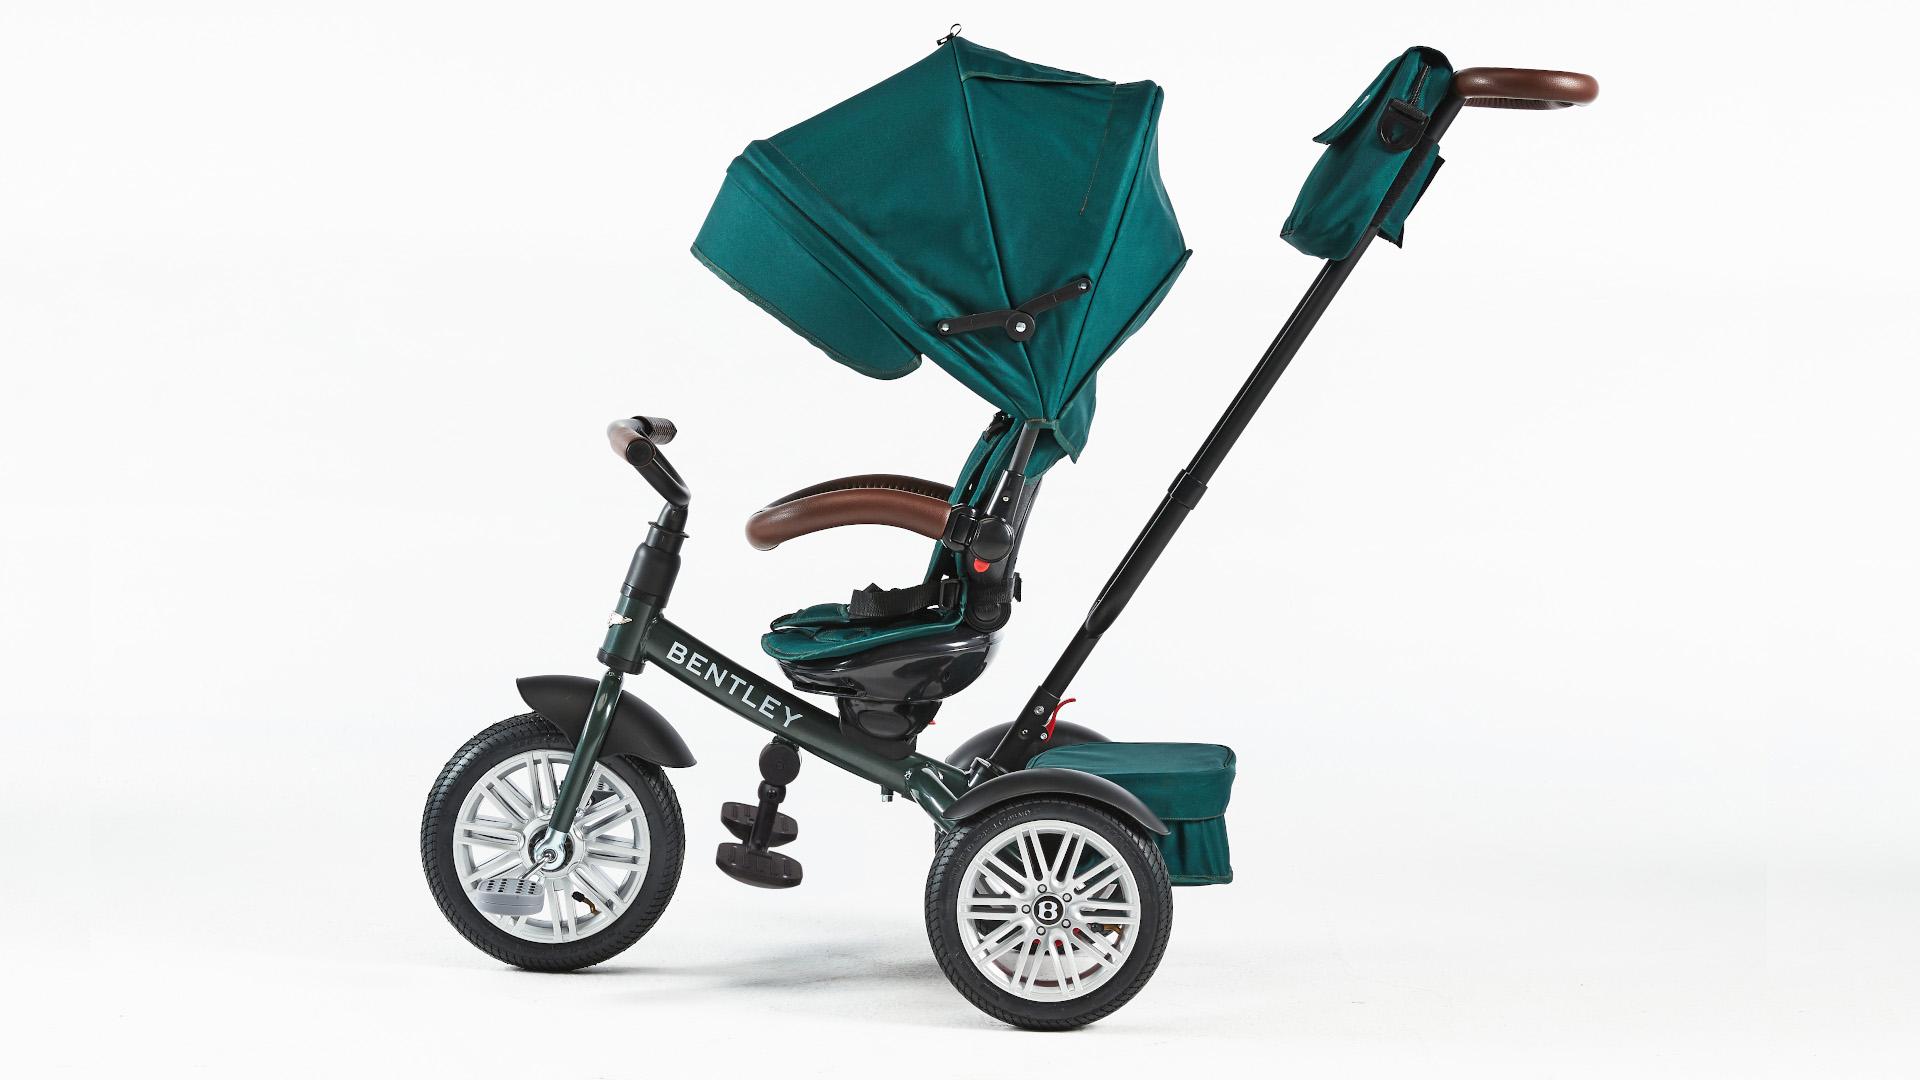 The Bentley Trike in Green